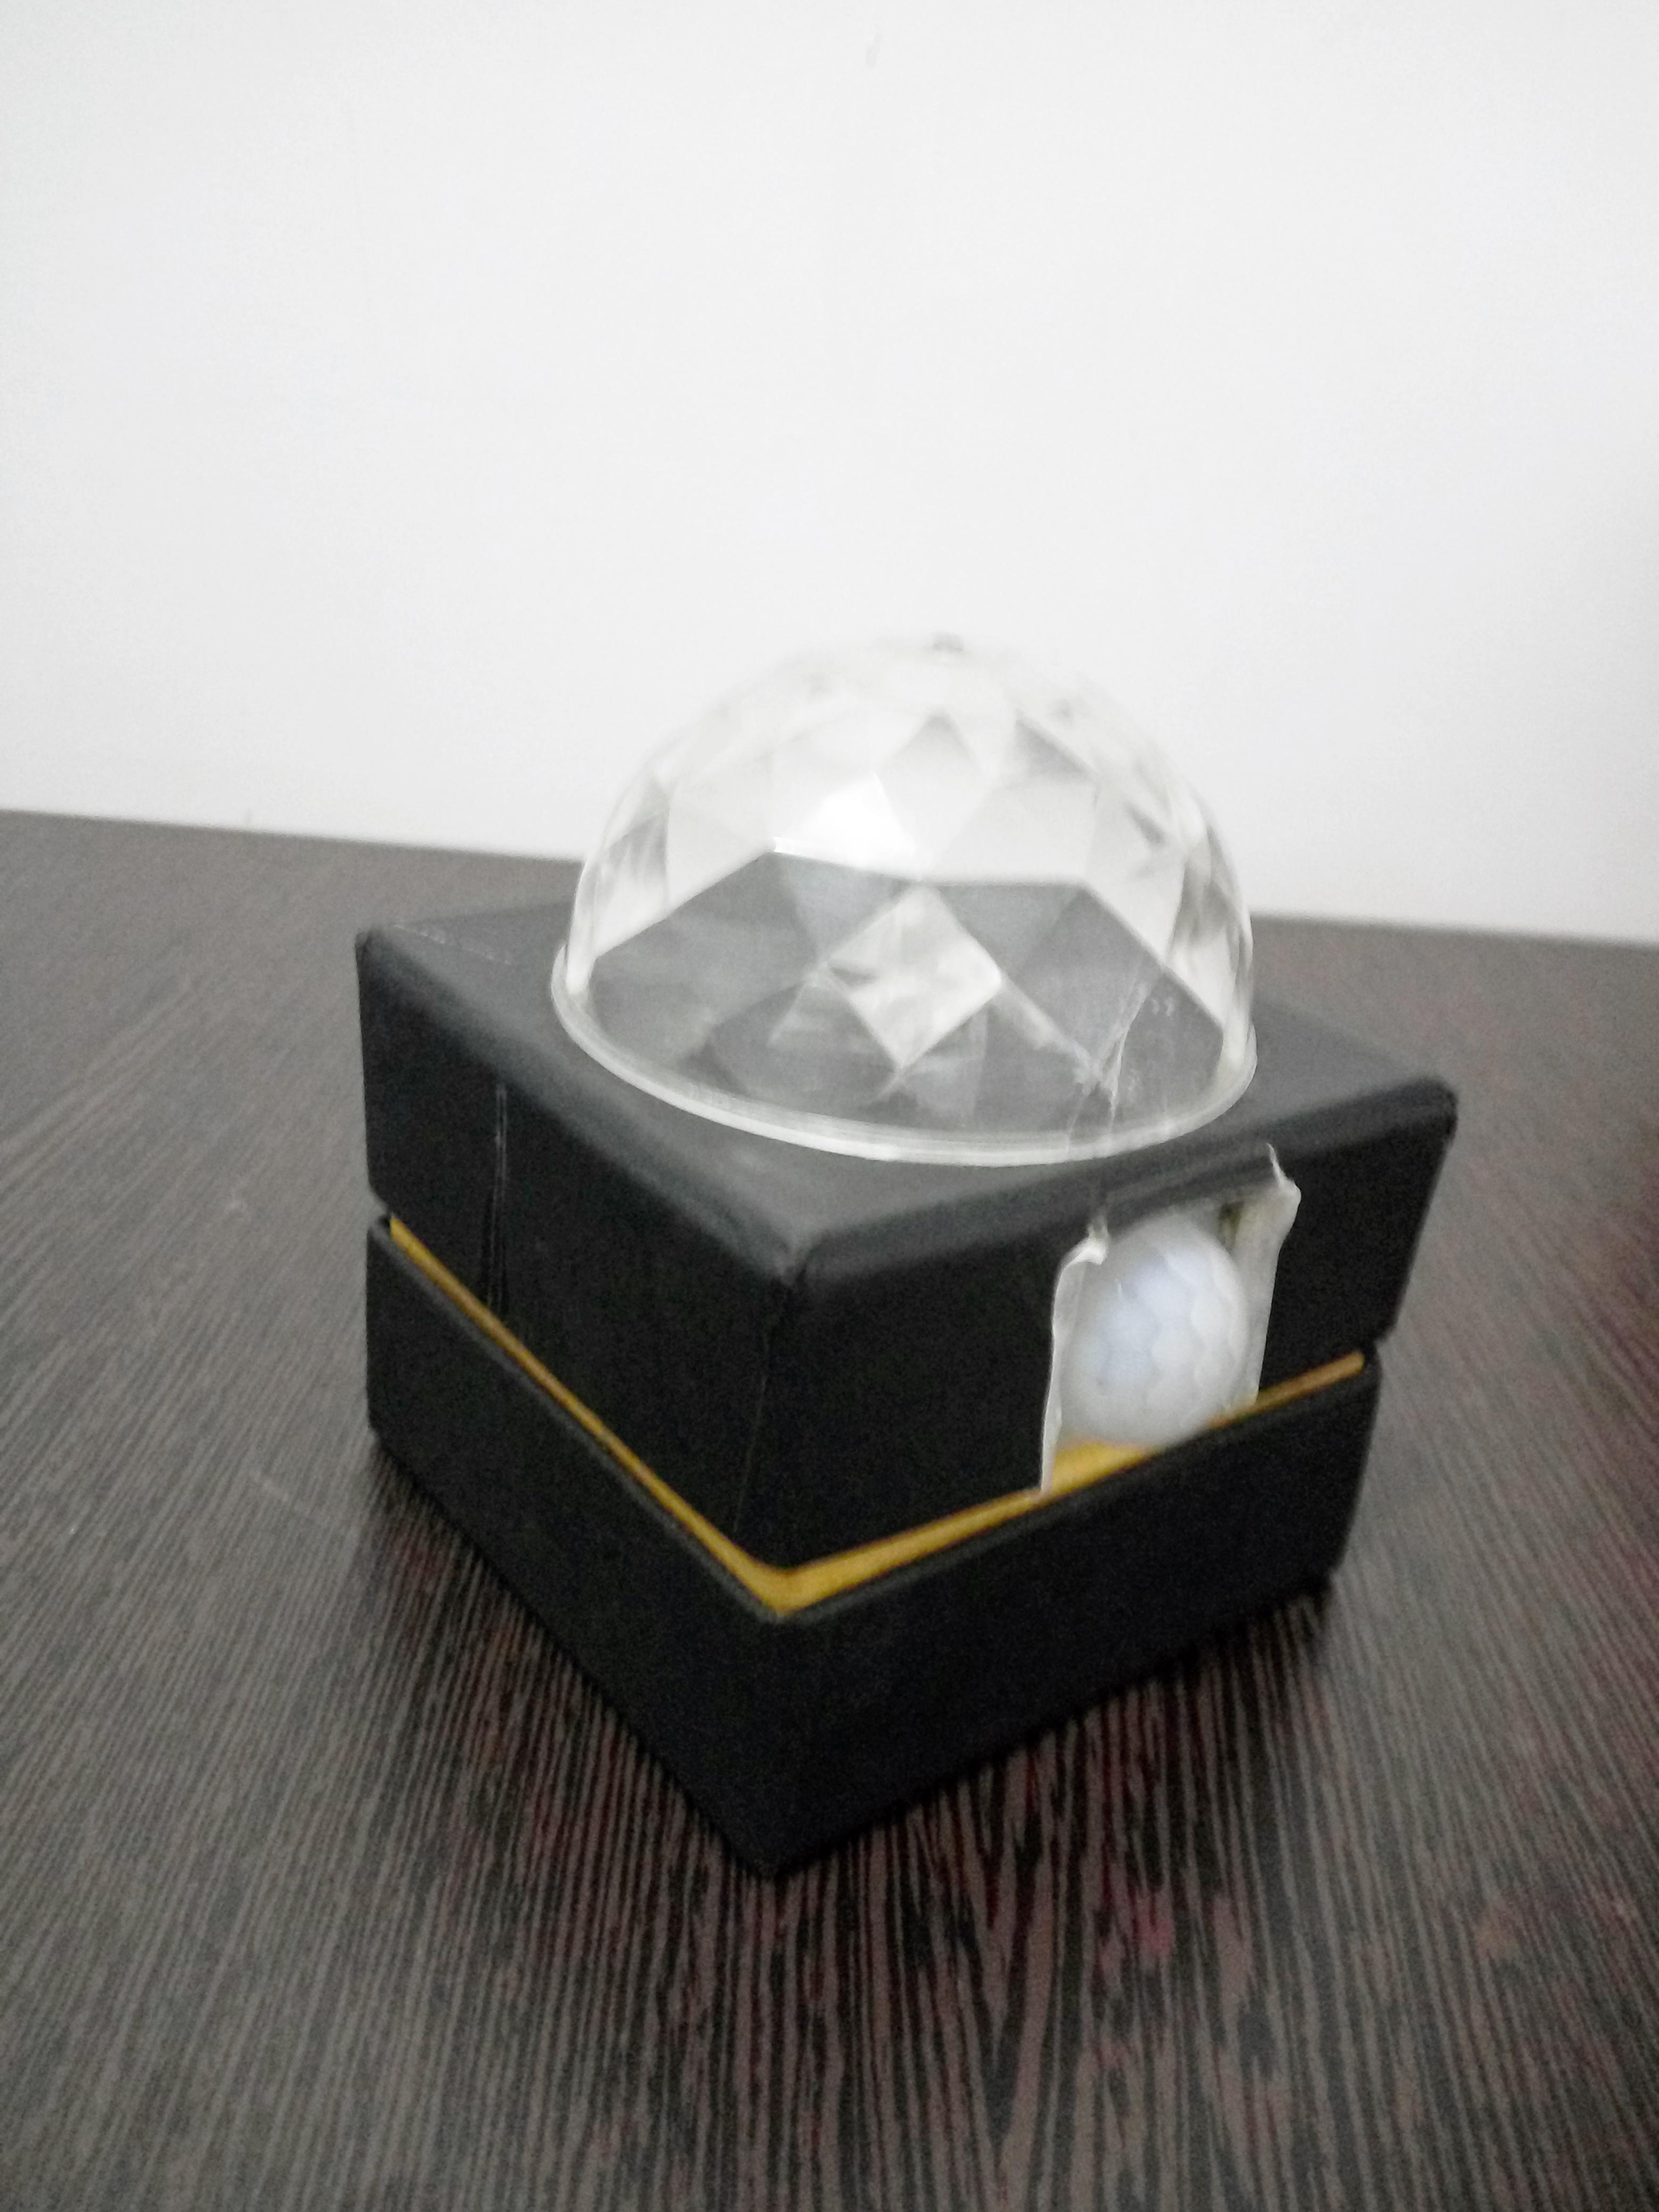 Pir Sensor Motion Sensing Device